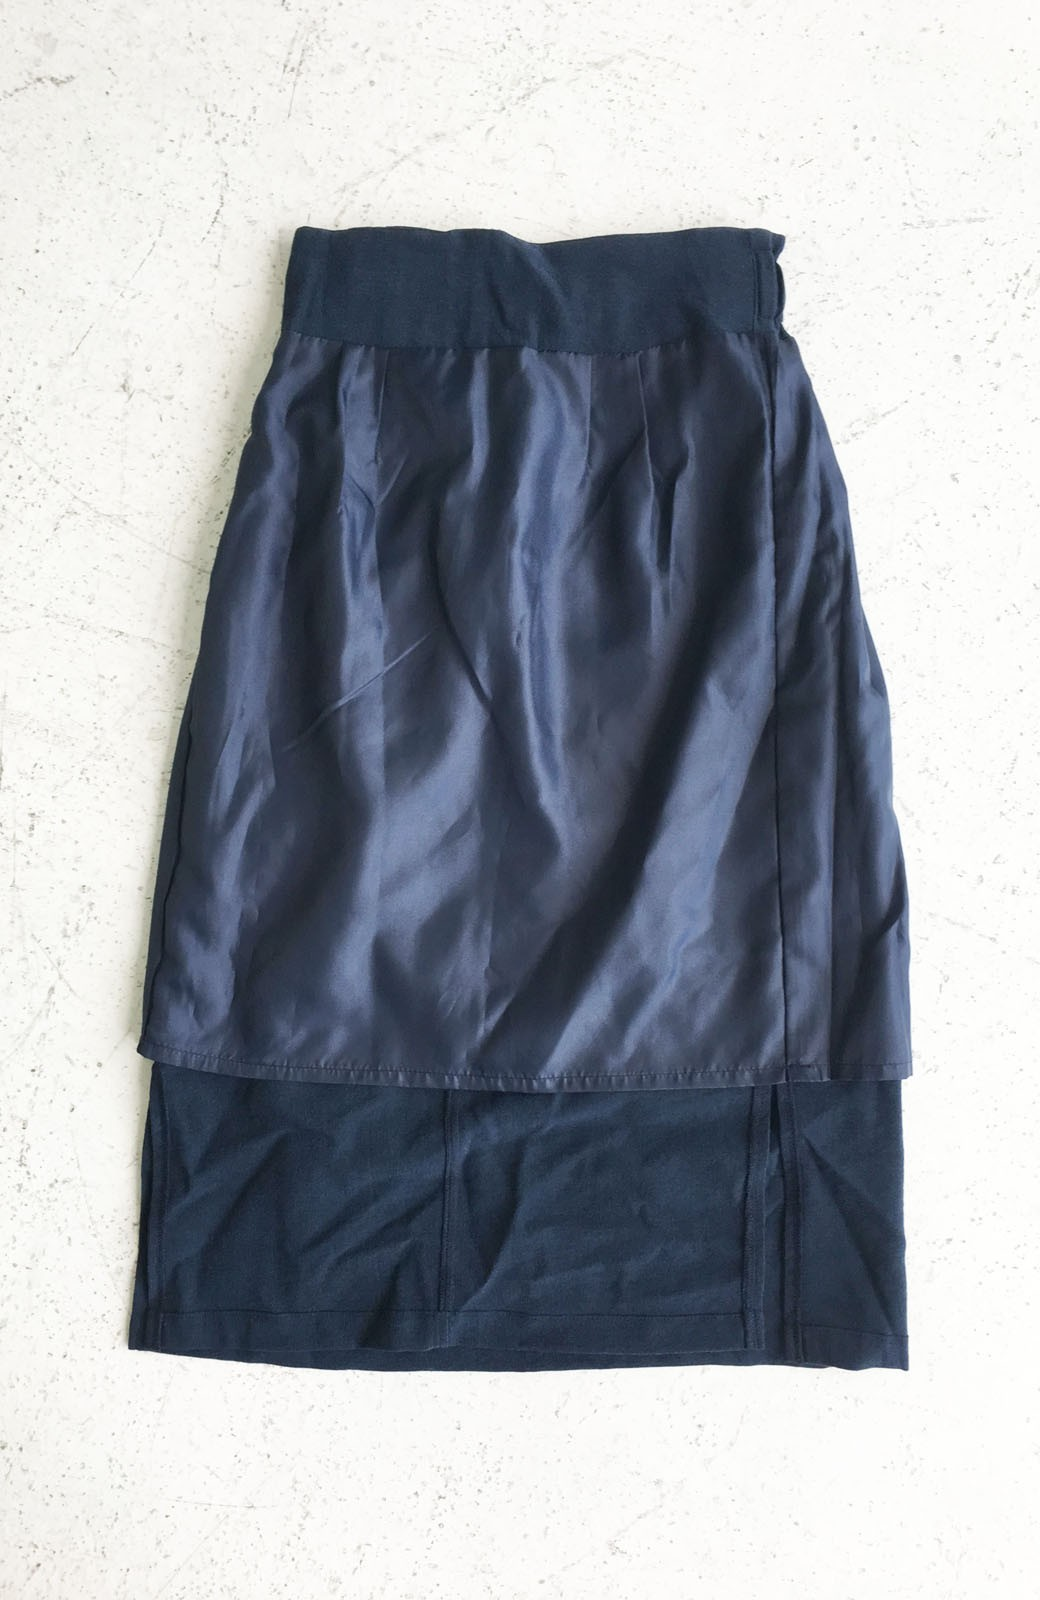 haco!  腹巻きとは呼ばせない ブルー期も華やかに過ごせる消臭加工裏地付きフリルデザインスカートセット【ブルー期】女の子バンザイ!プロジェクト <ネイビー>の商品写真6